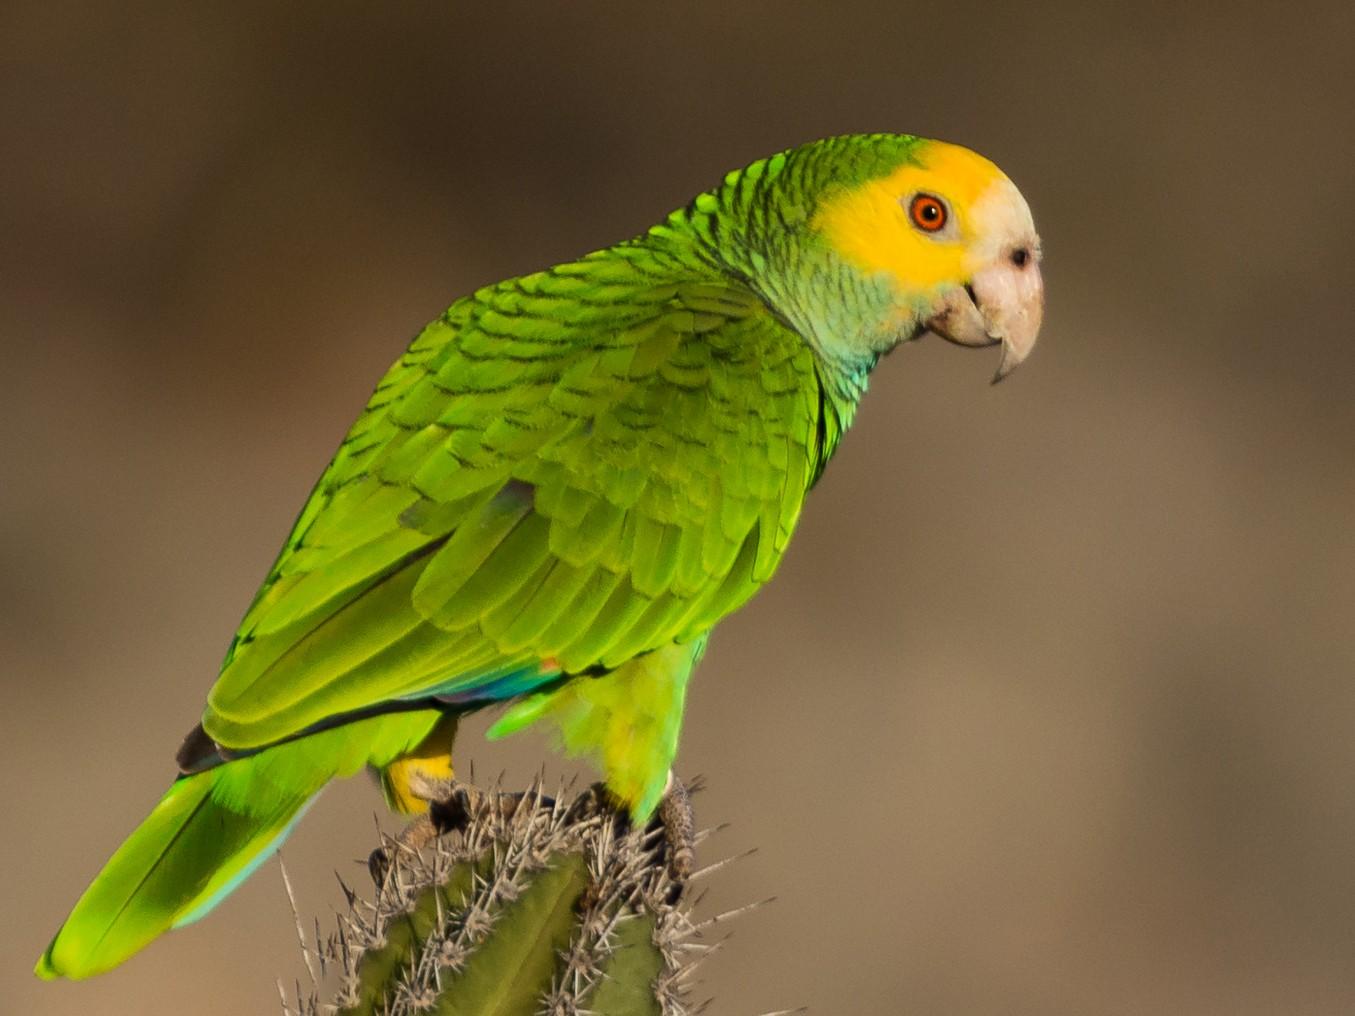 Yellow-shouldered Parrot - Suzie McCann